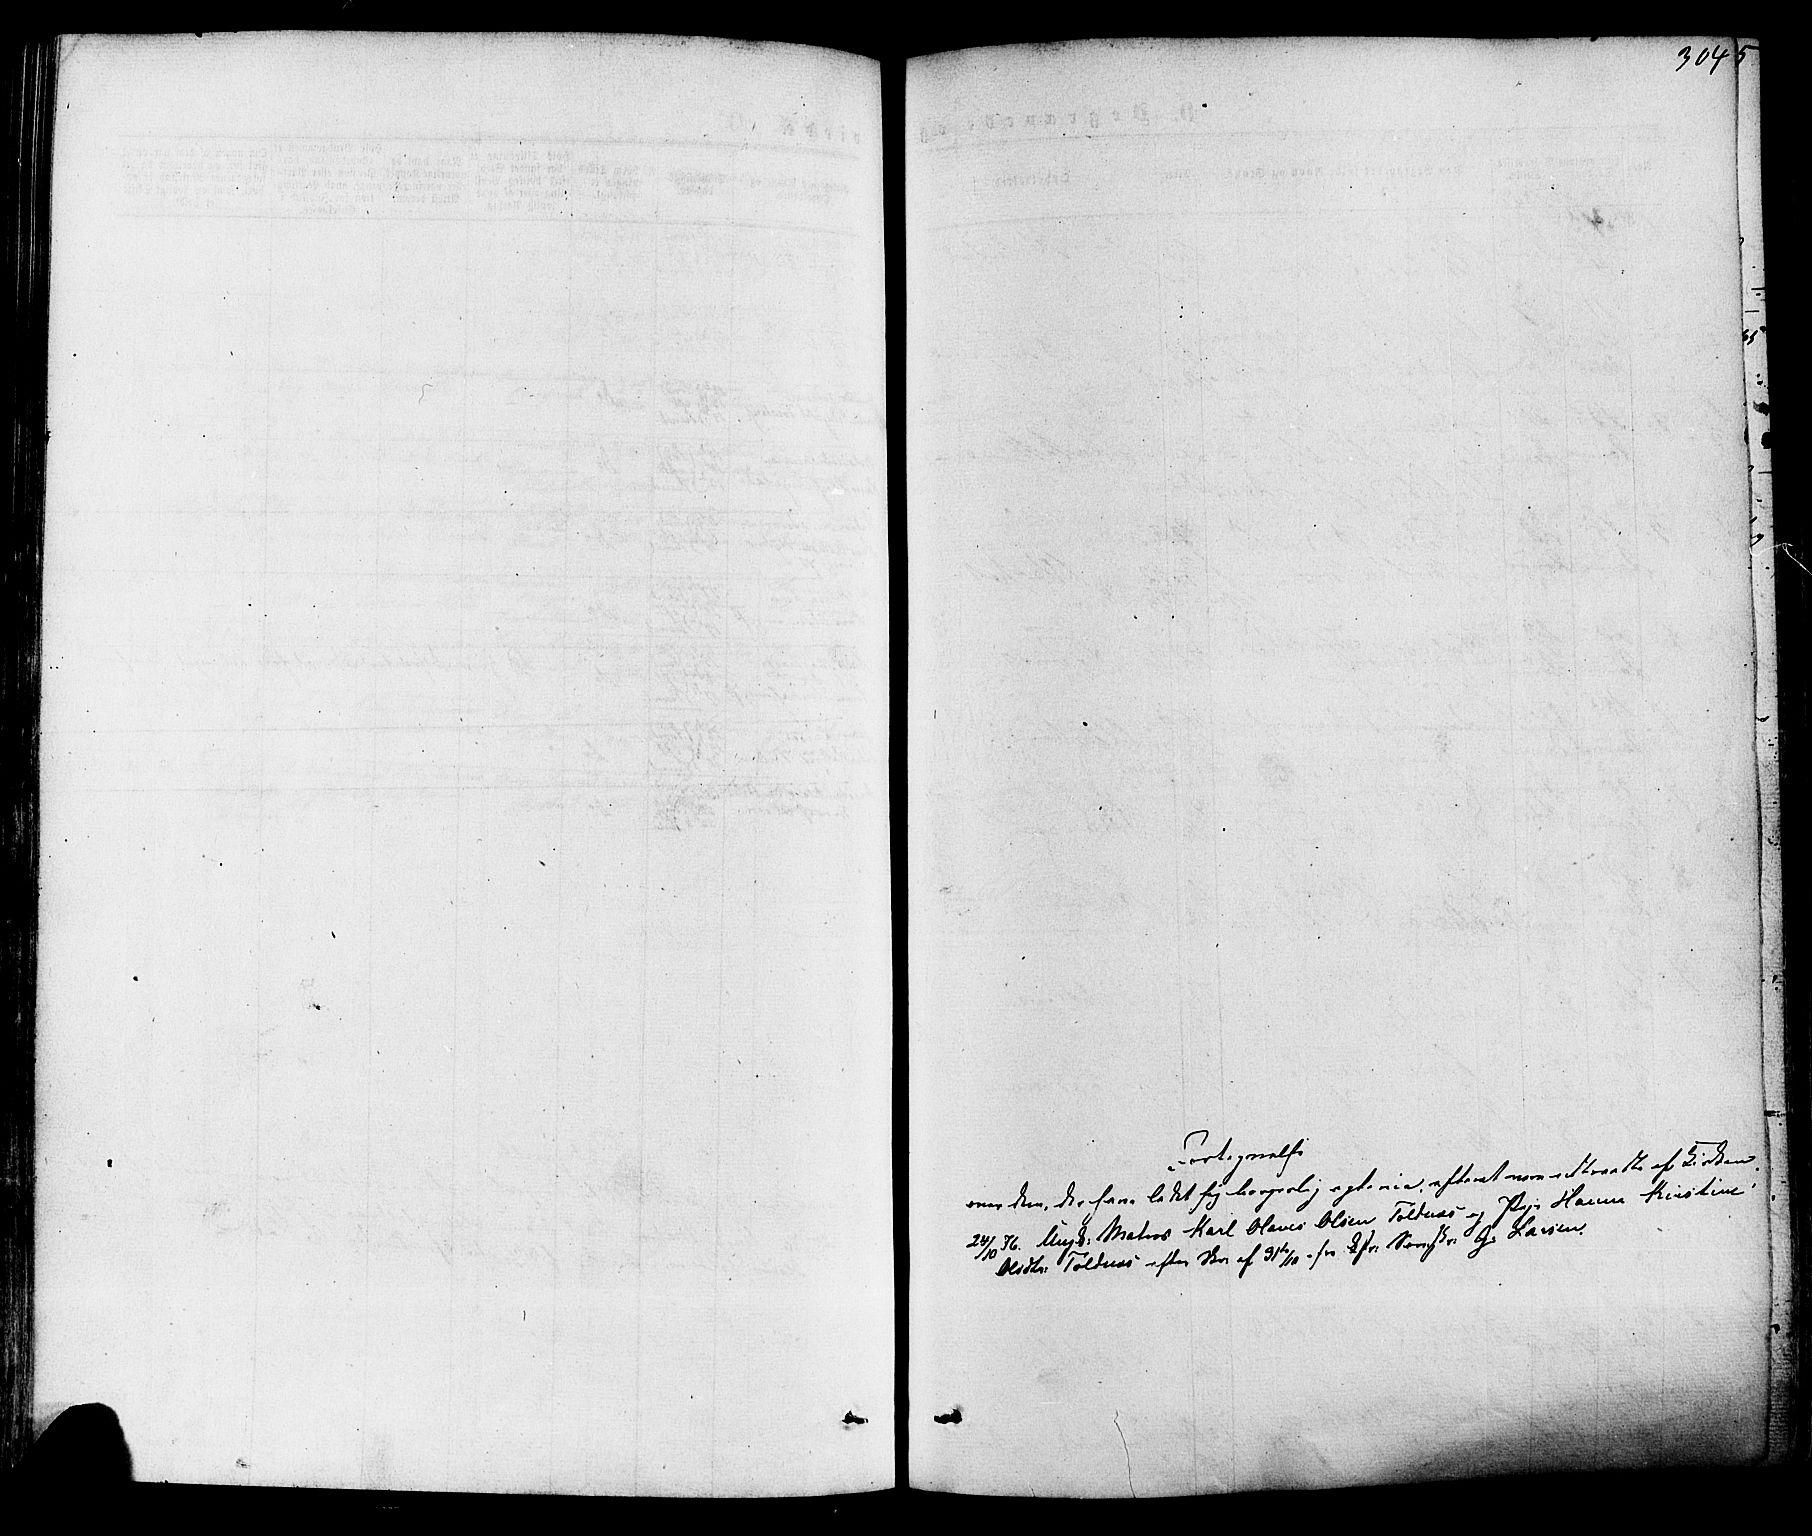 SAKO, Solum kirkebøker, F/Fa/L0008: Ministerialbok nr. I 8, 1865-1876, s. 304